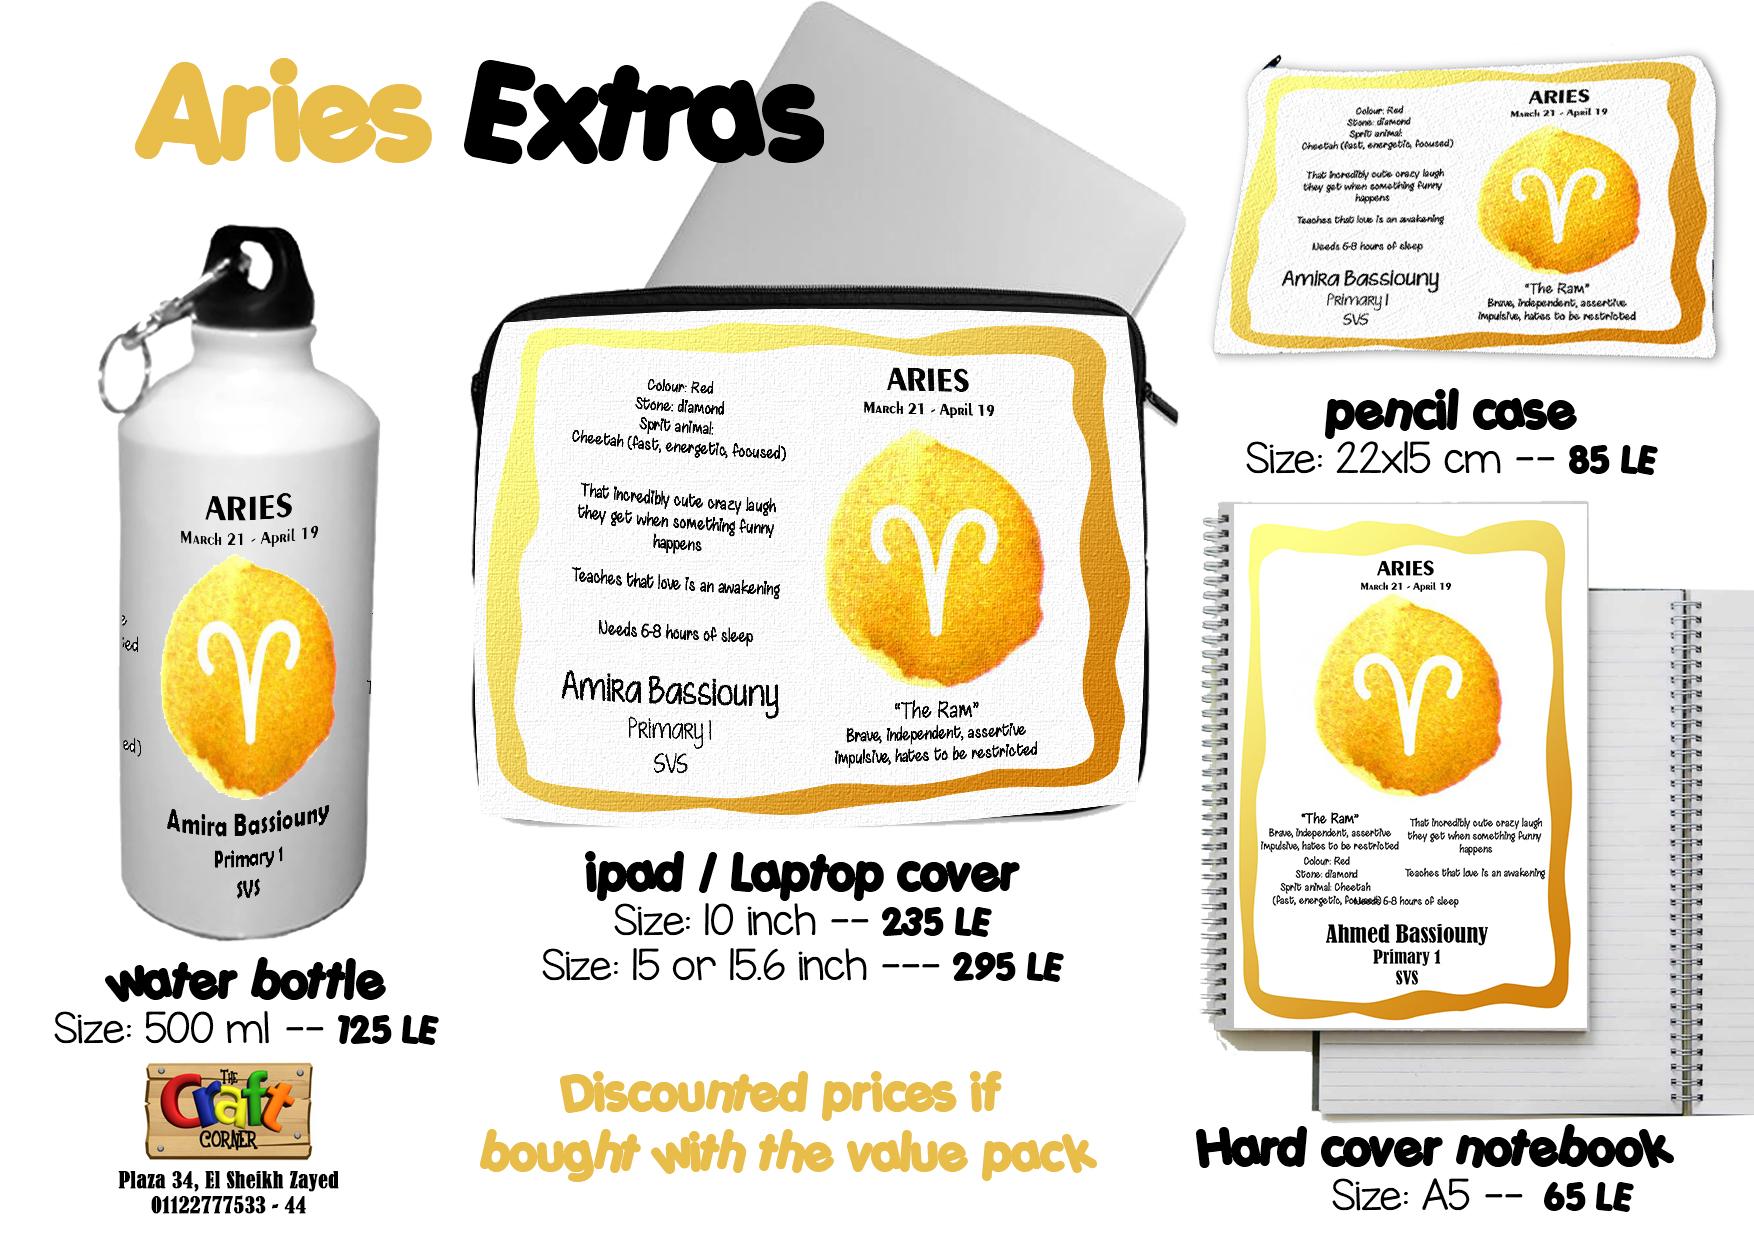 Aries Extras